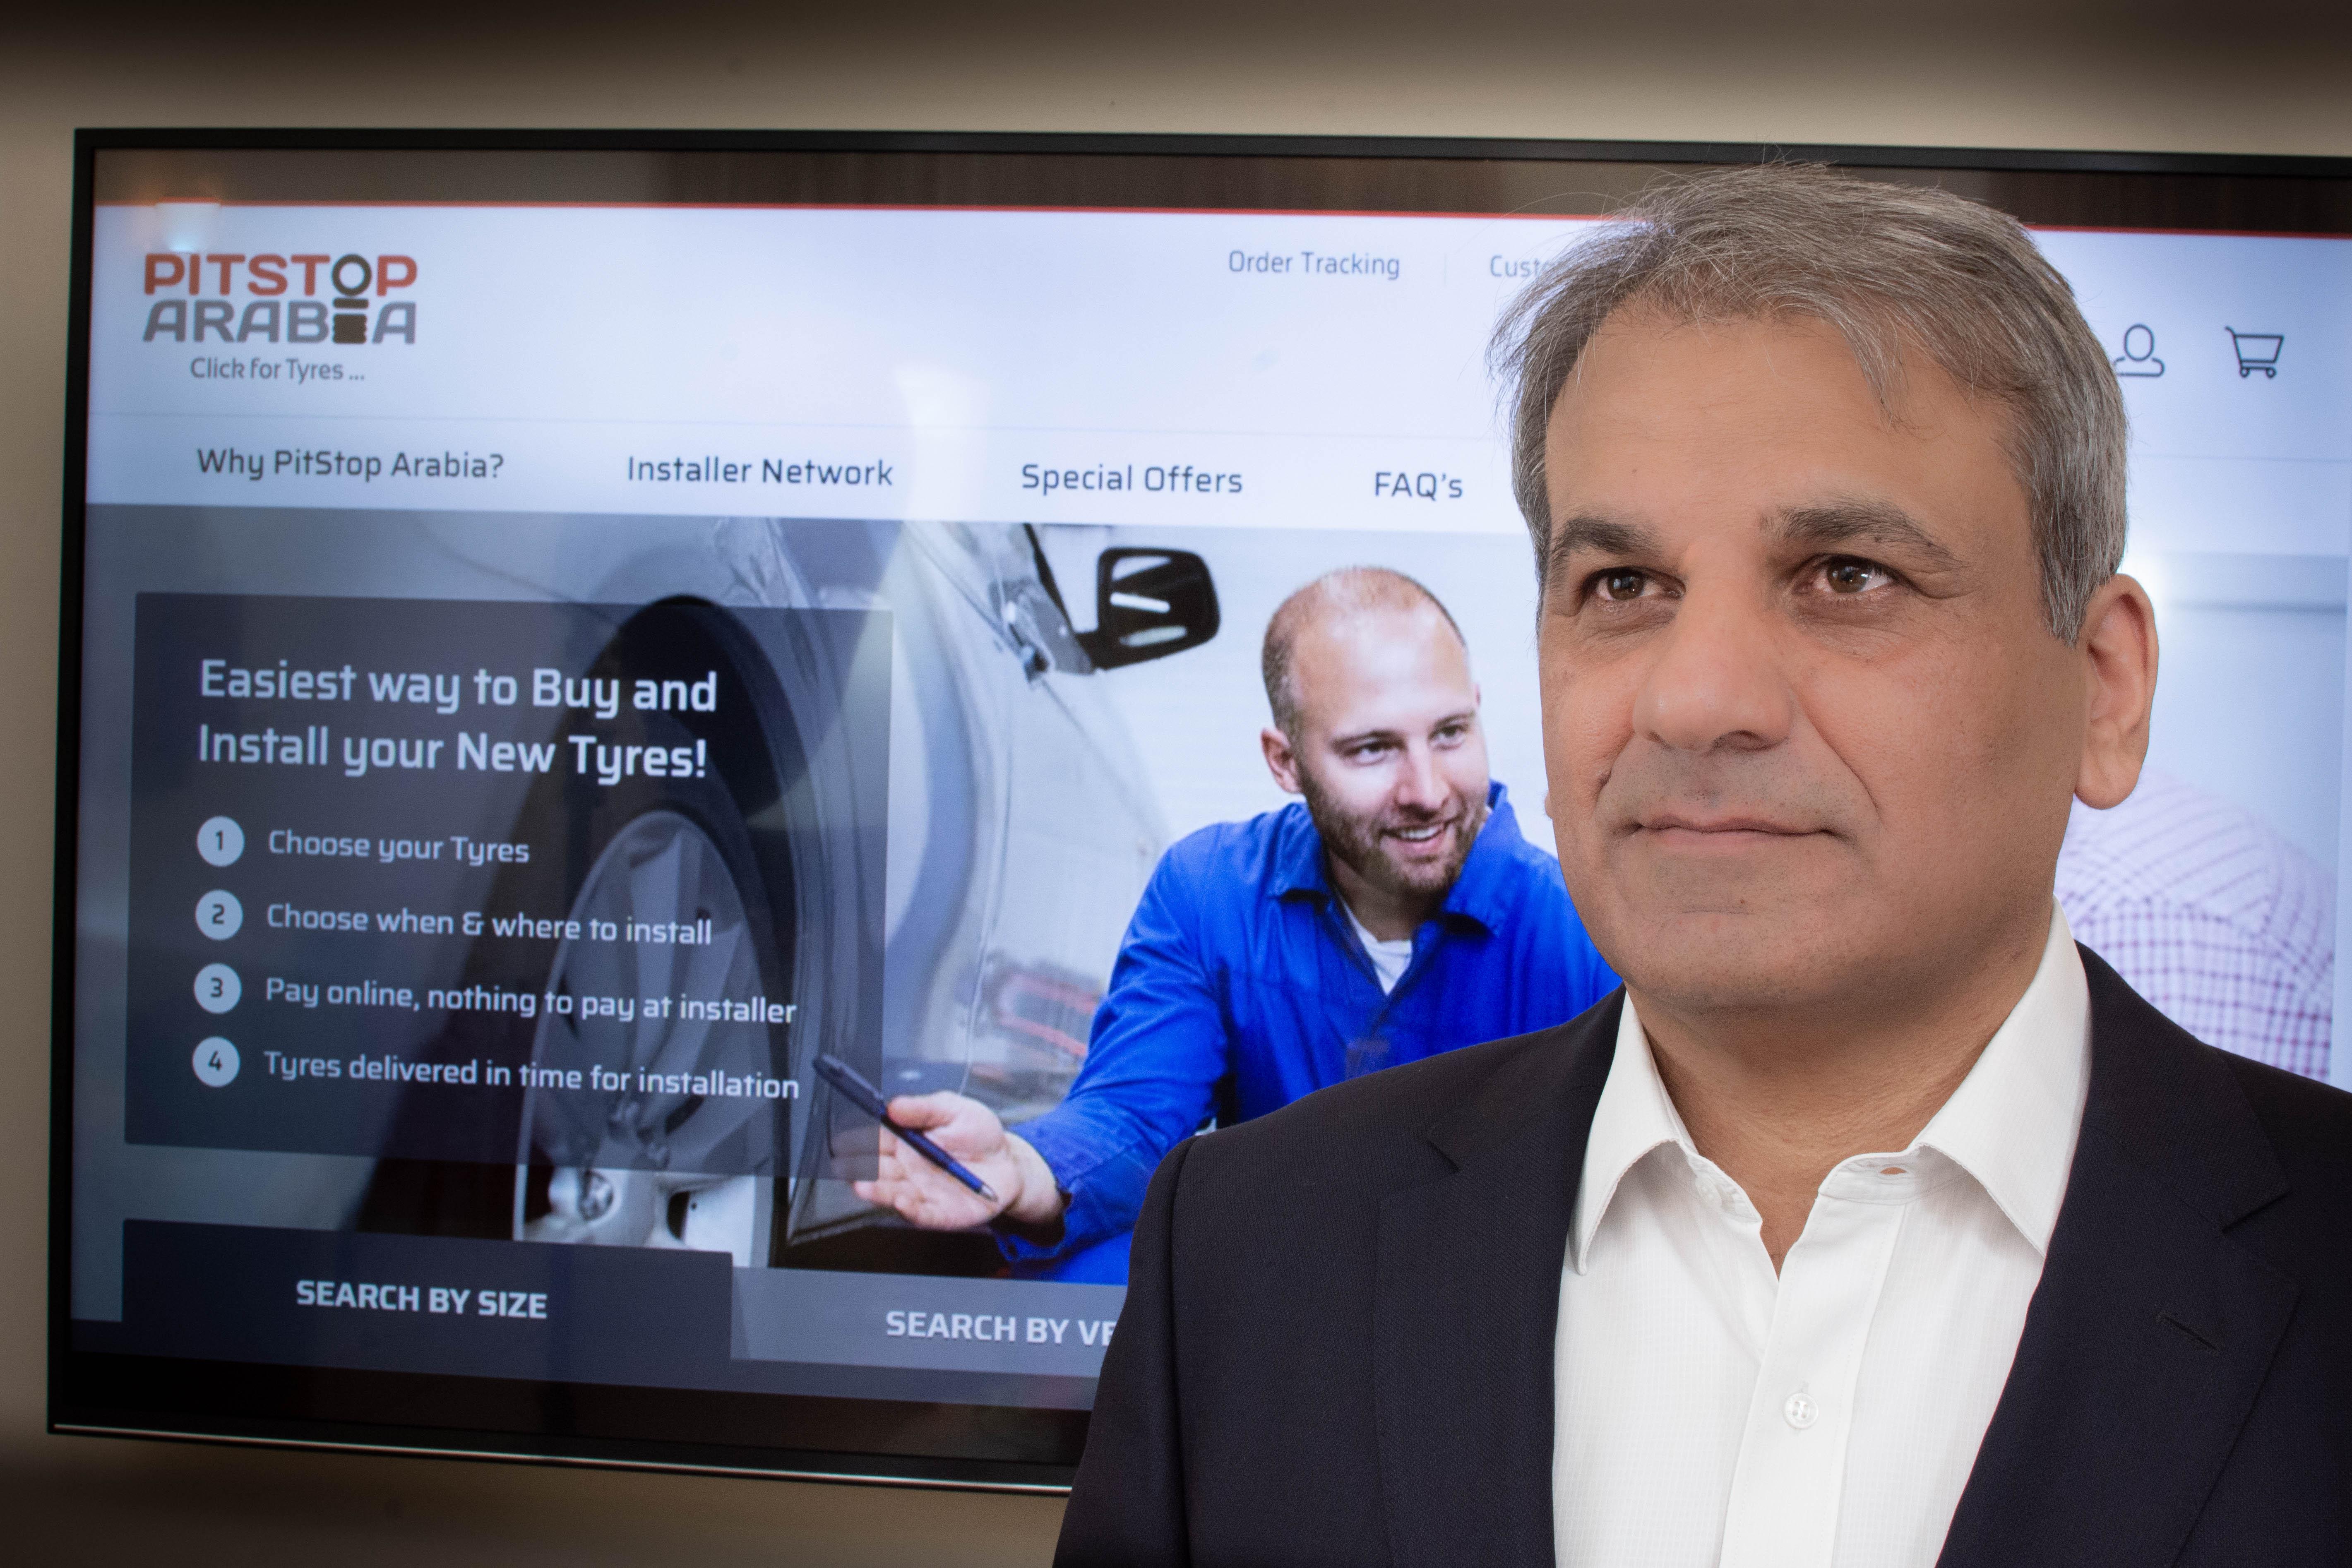 Aadil Ishfaq - Managing Director, PitStopArabia.com